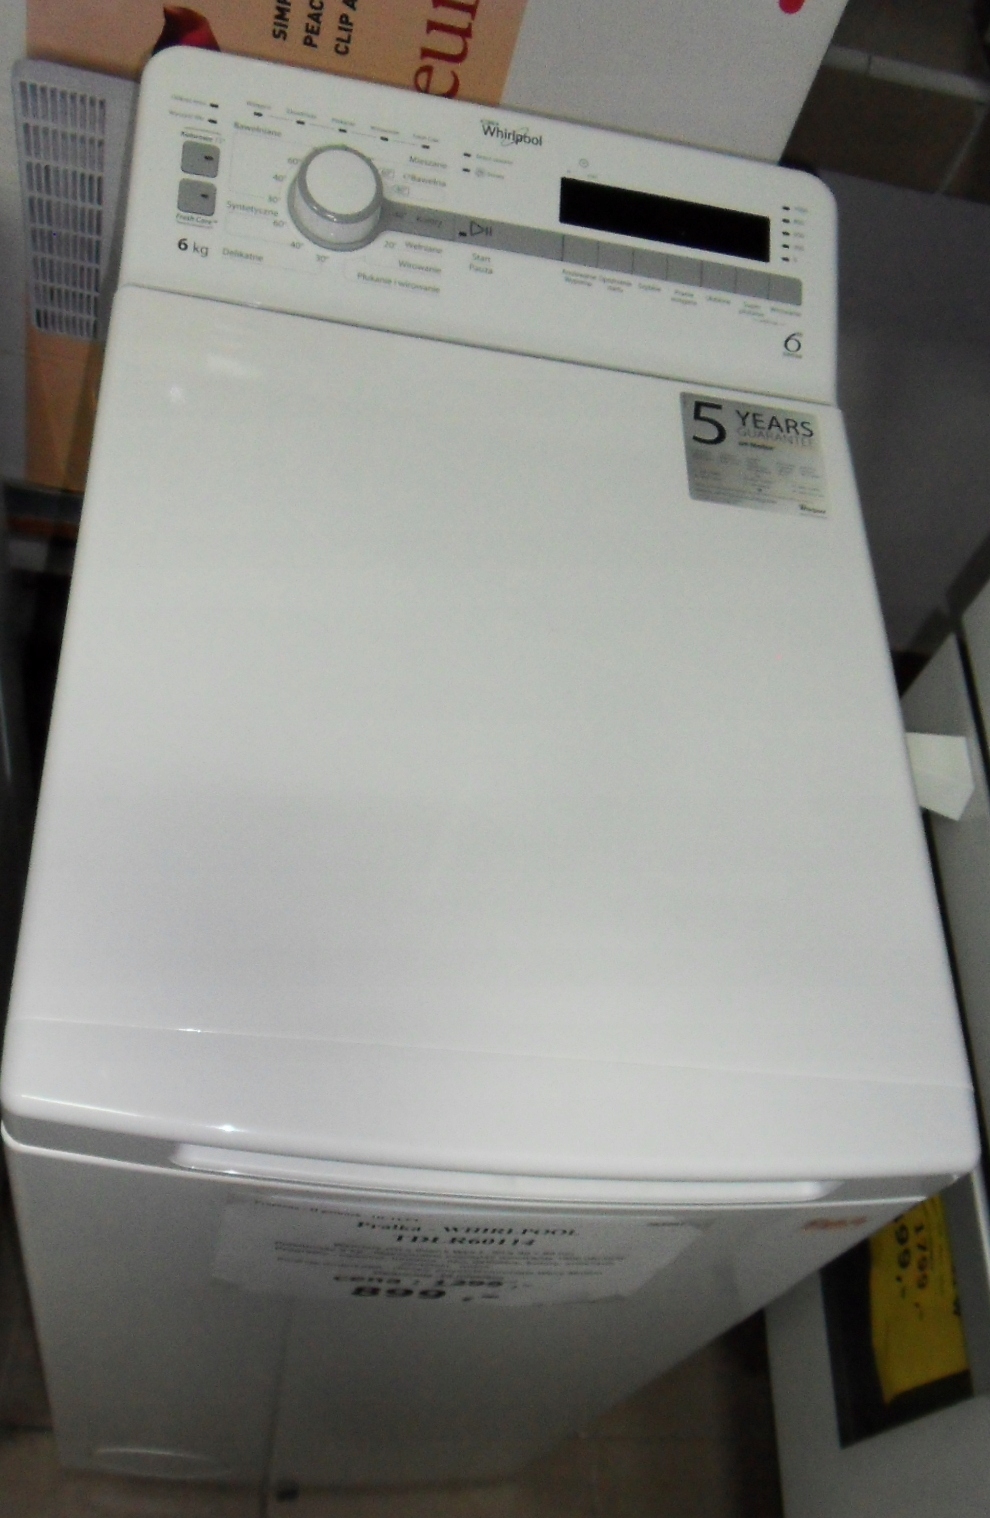 Outlet AGD Pralka Whirlpool TDLR60114